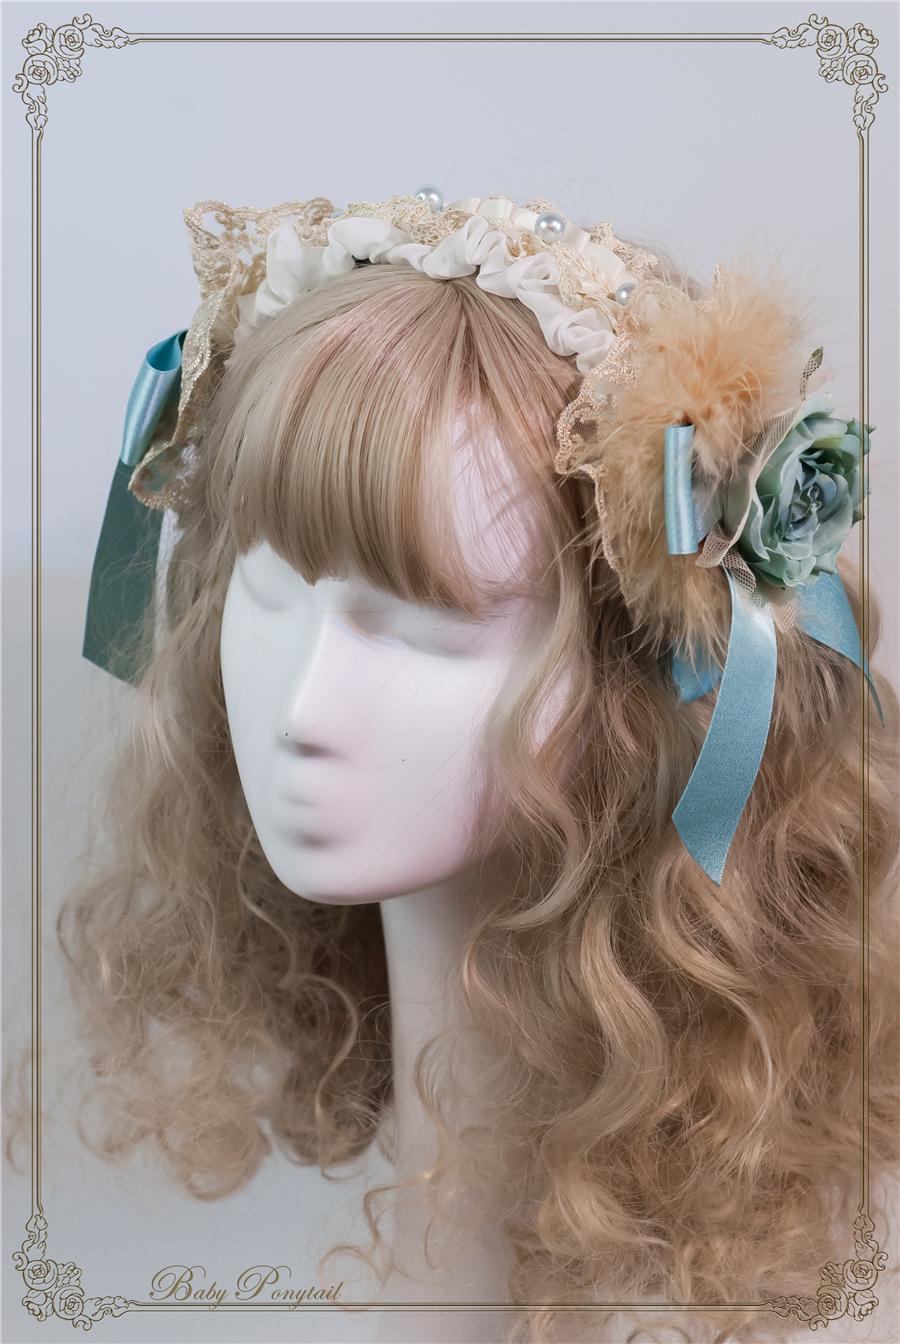 Baby Ponytail_Stock photo_Circus Princess_Rose Head Dress Sax_02.jpg